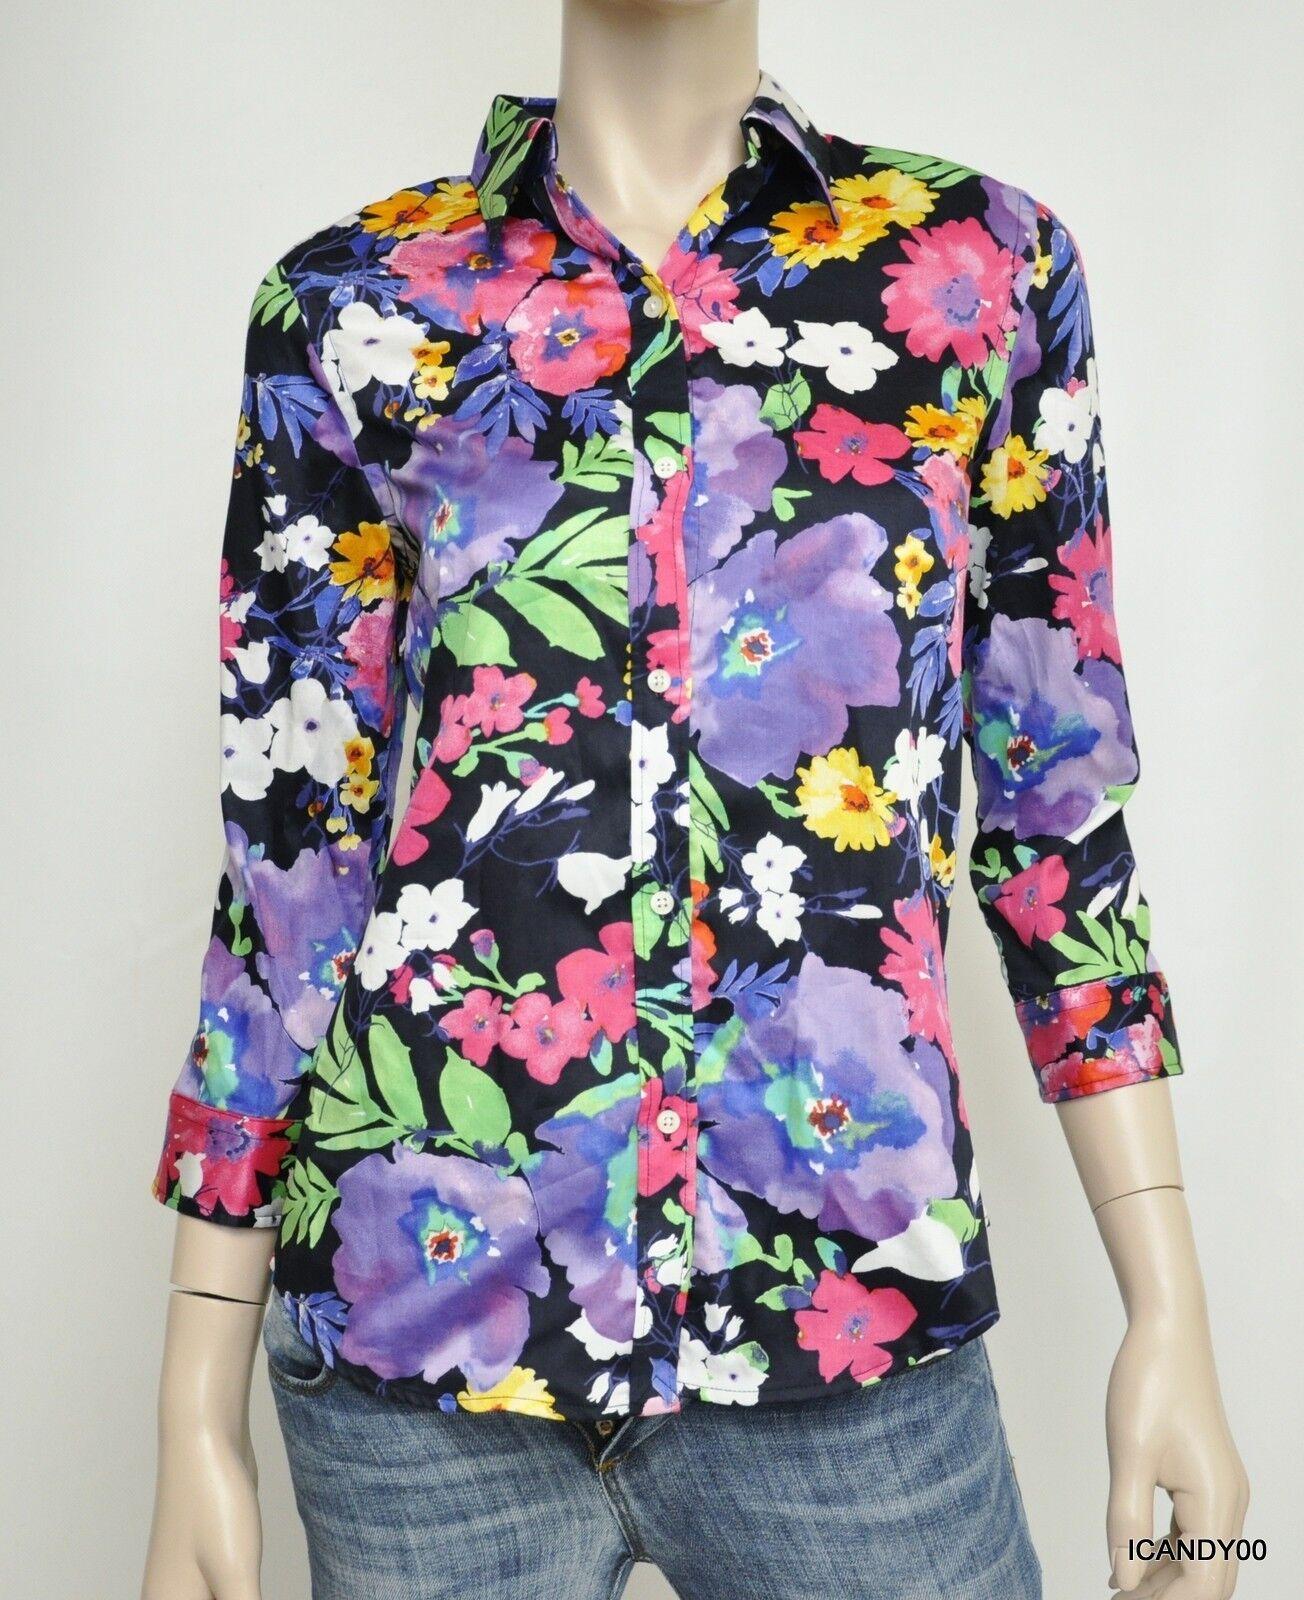 Nwt  Ralph Lauren 3 4 Sleeve Button Front Shirt Top Blouse Navy Floral S